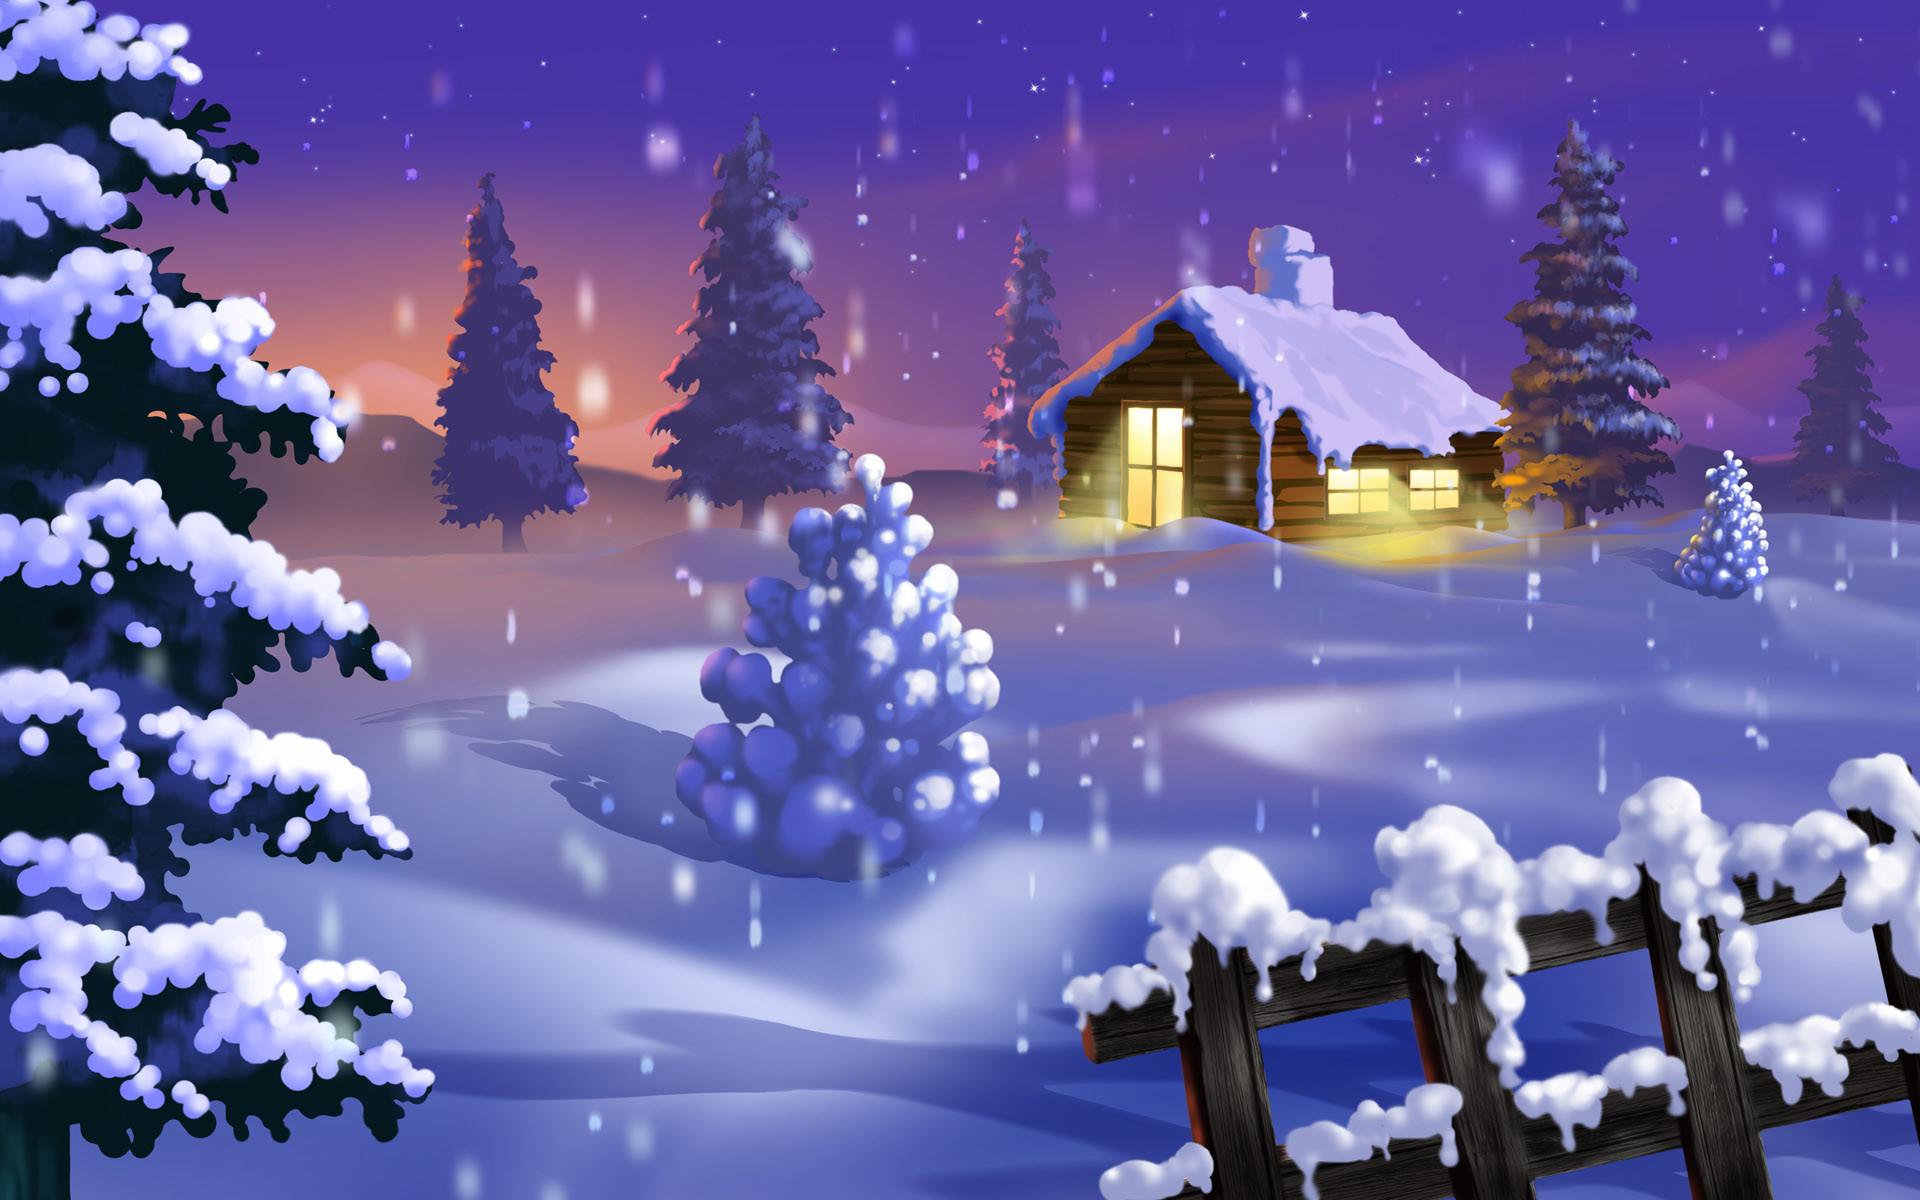 Christmas Wallpaper for Desktop puter 54 images